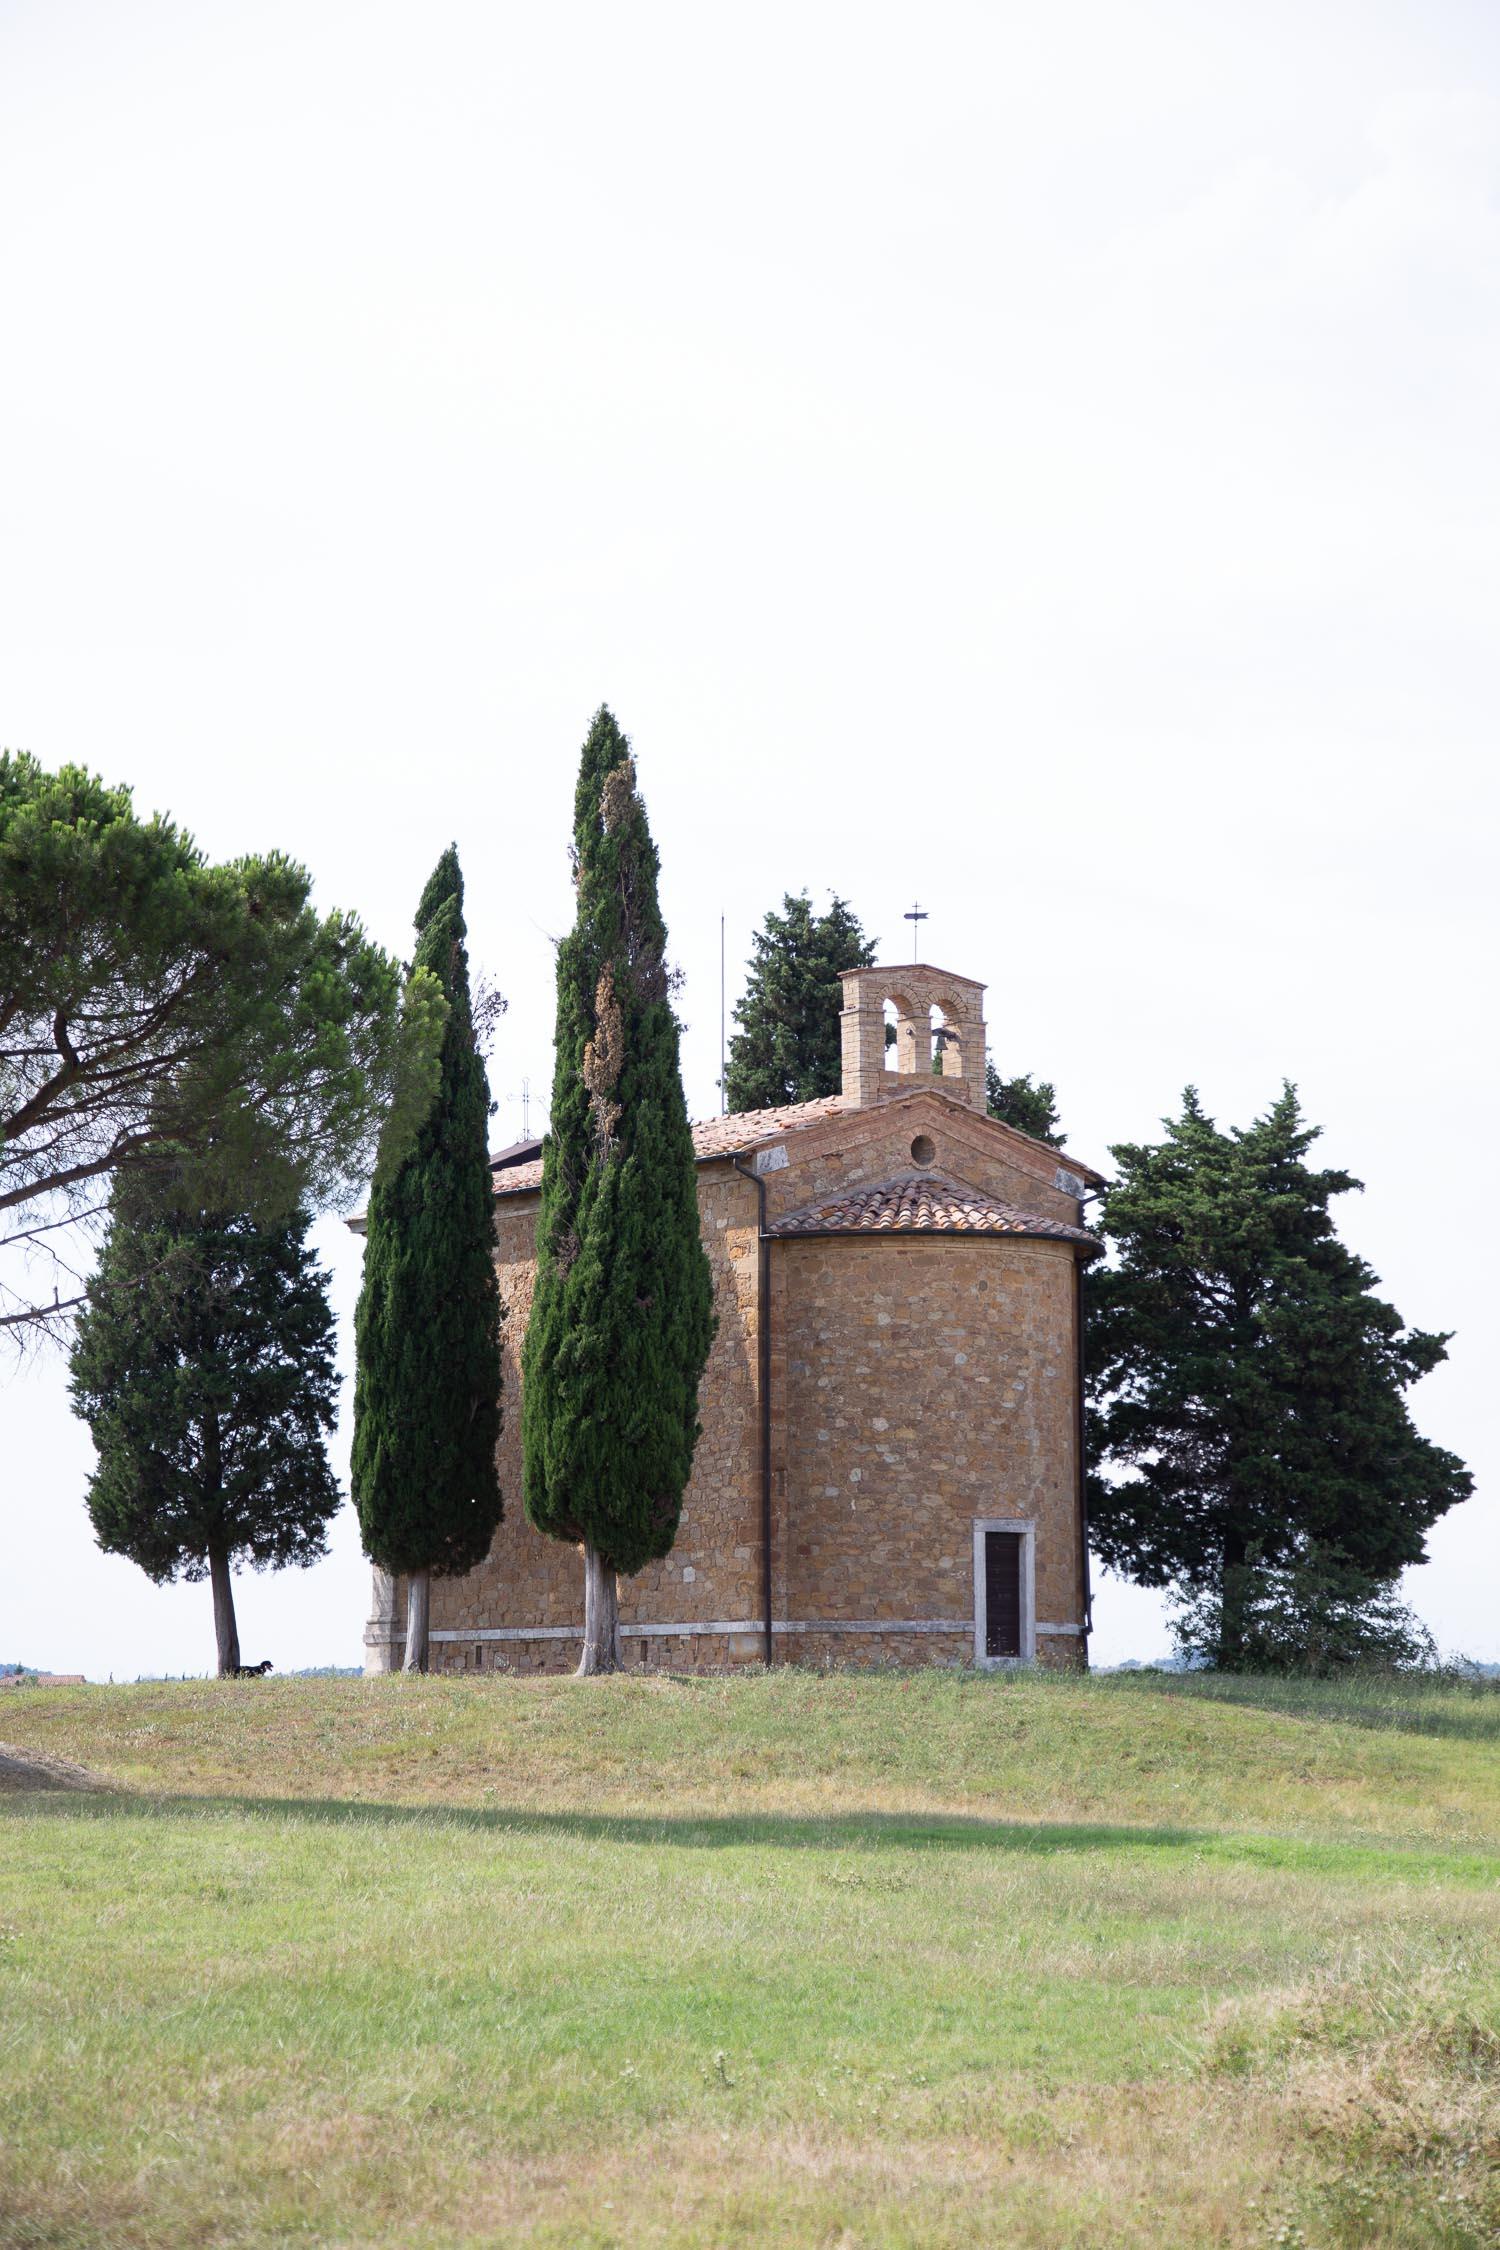 Tuscany-country-church-5239.jpg